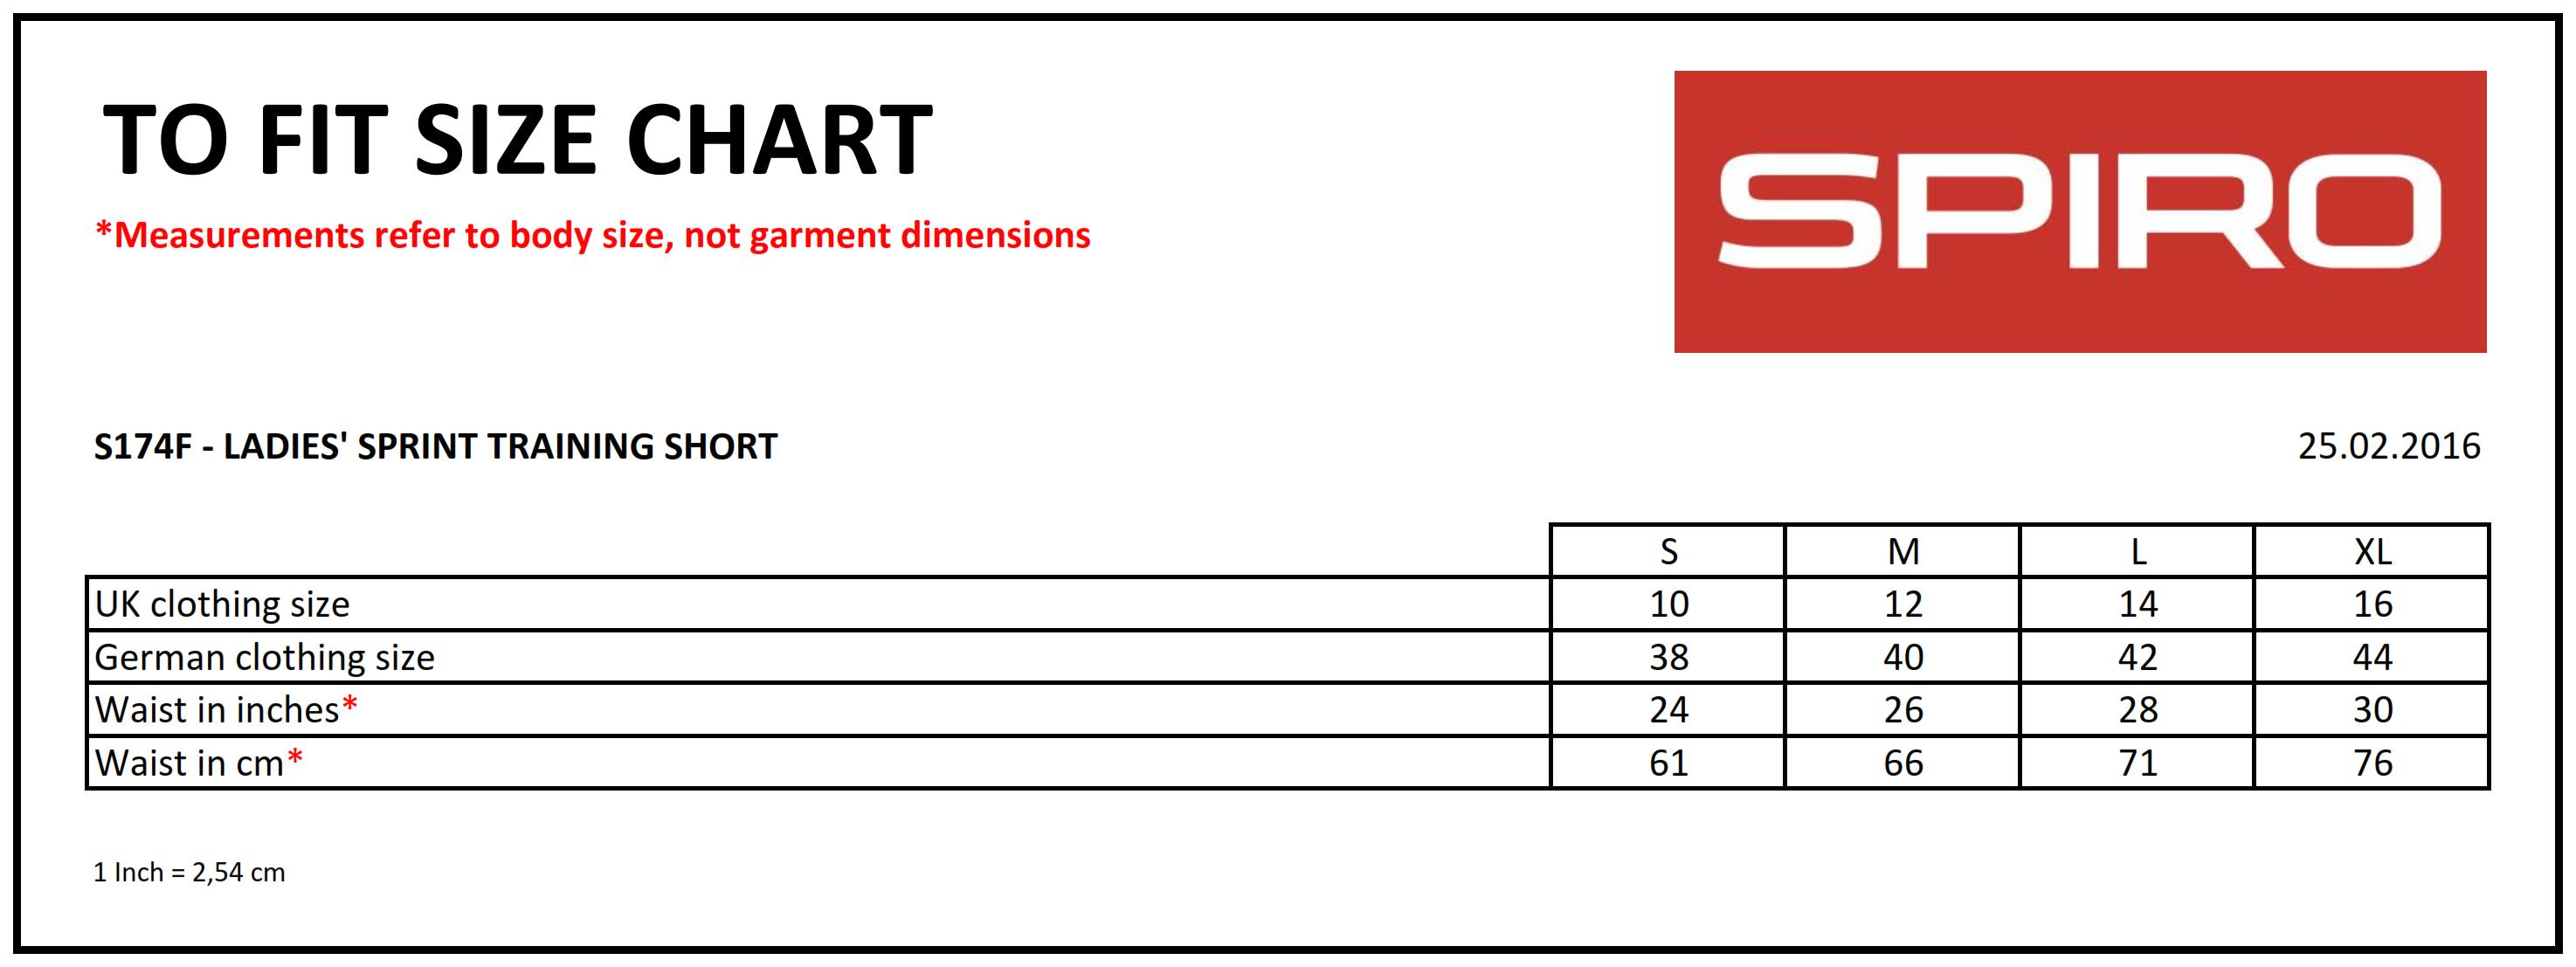 Result: Ladies` Spiro Sprint Training Short R174F